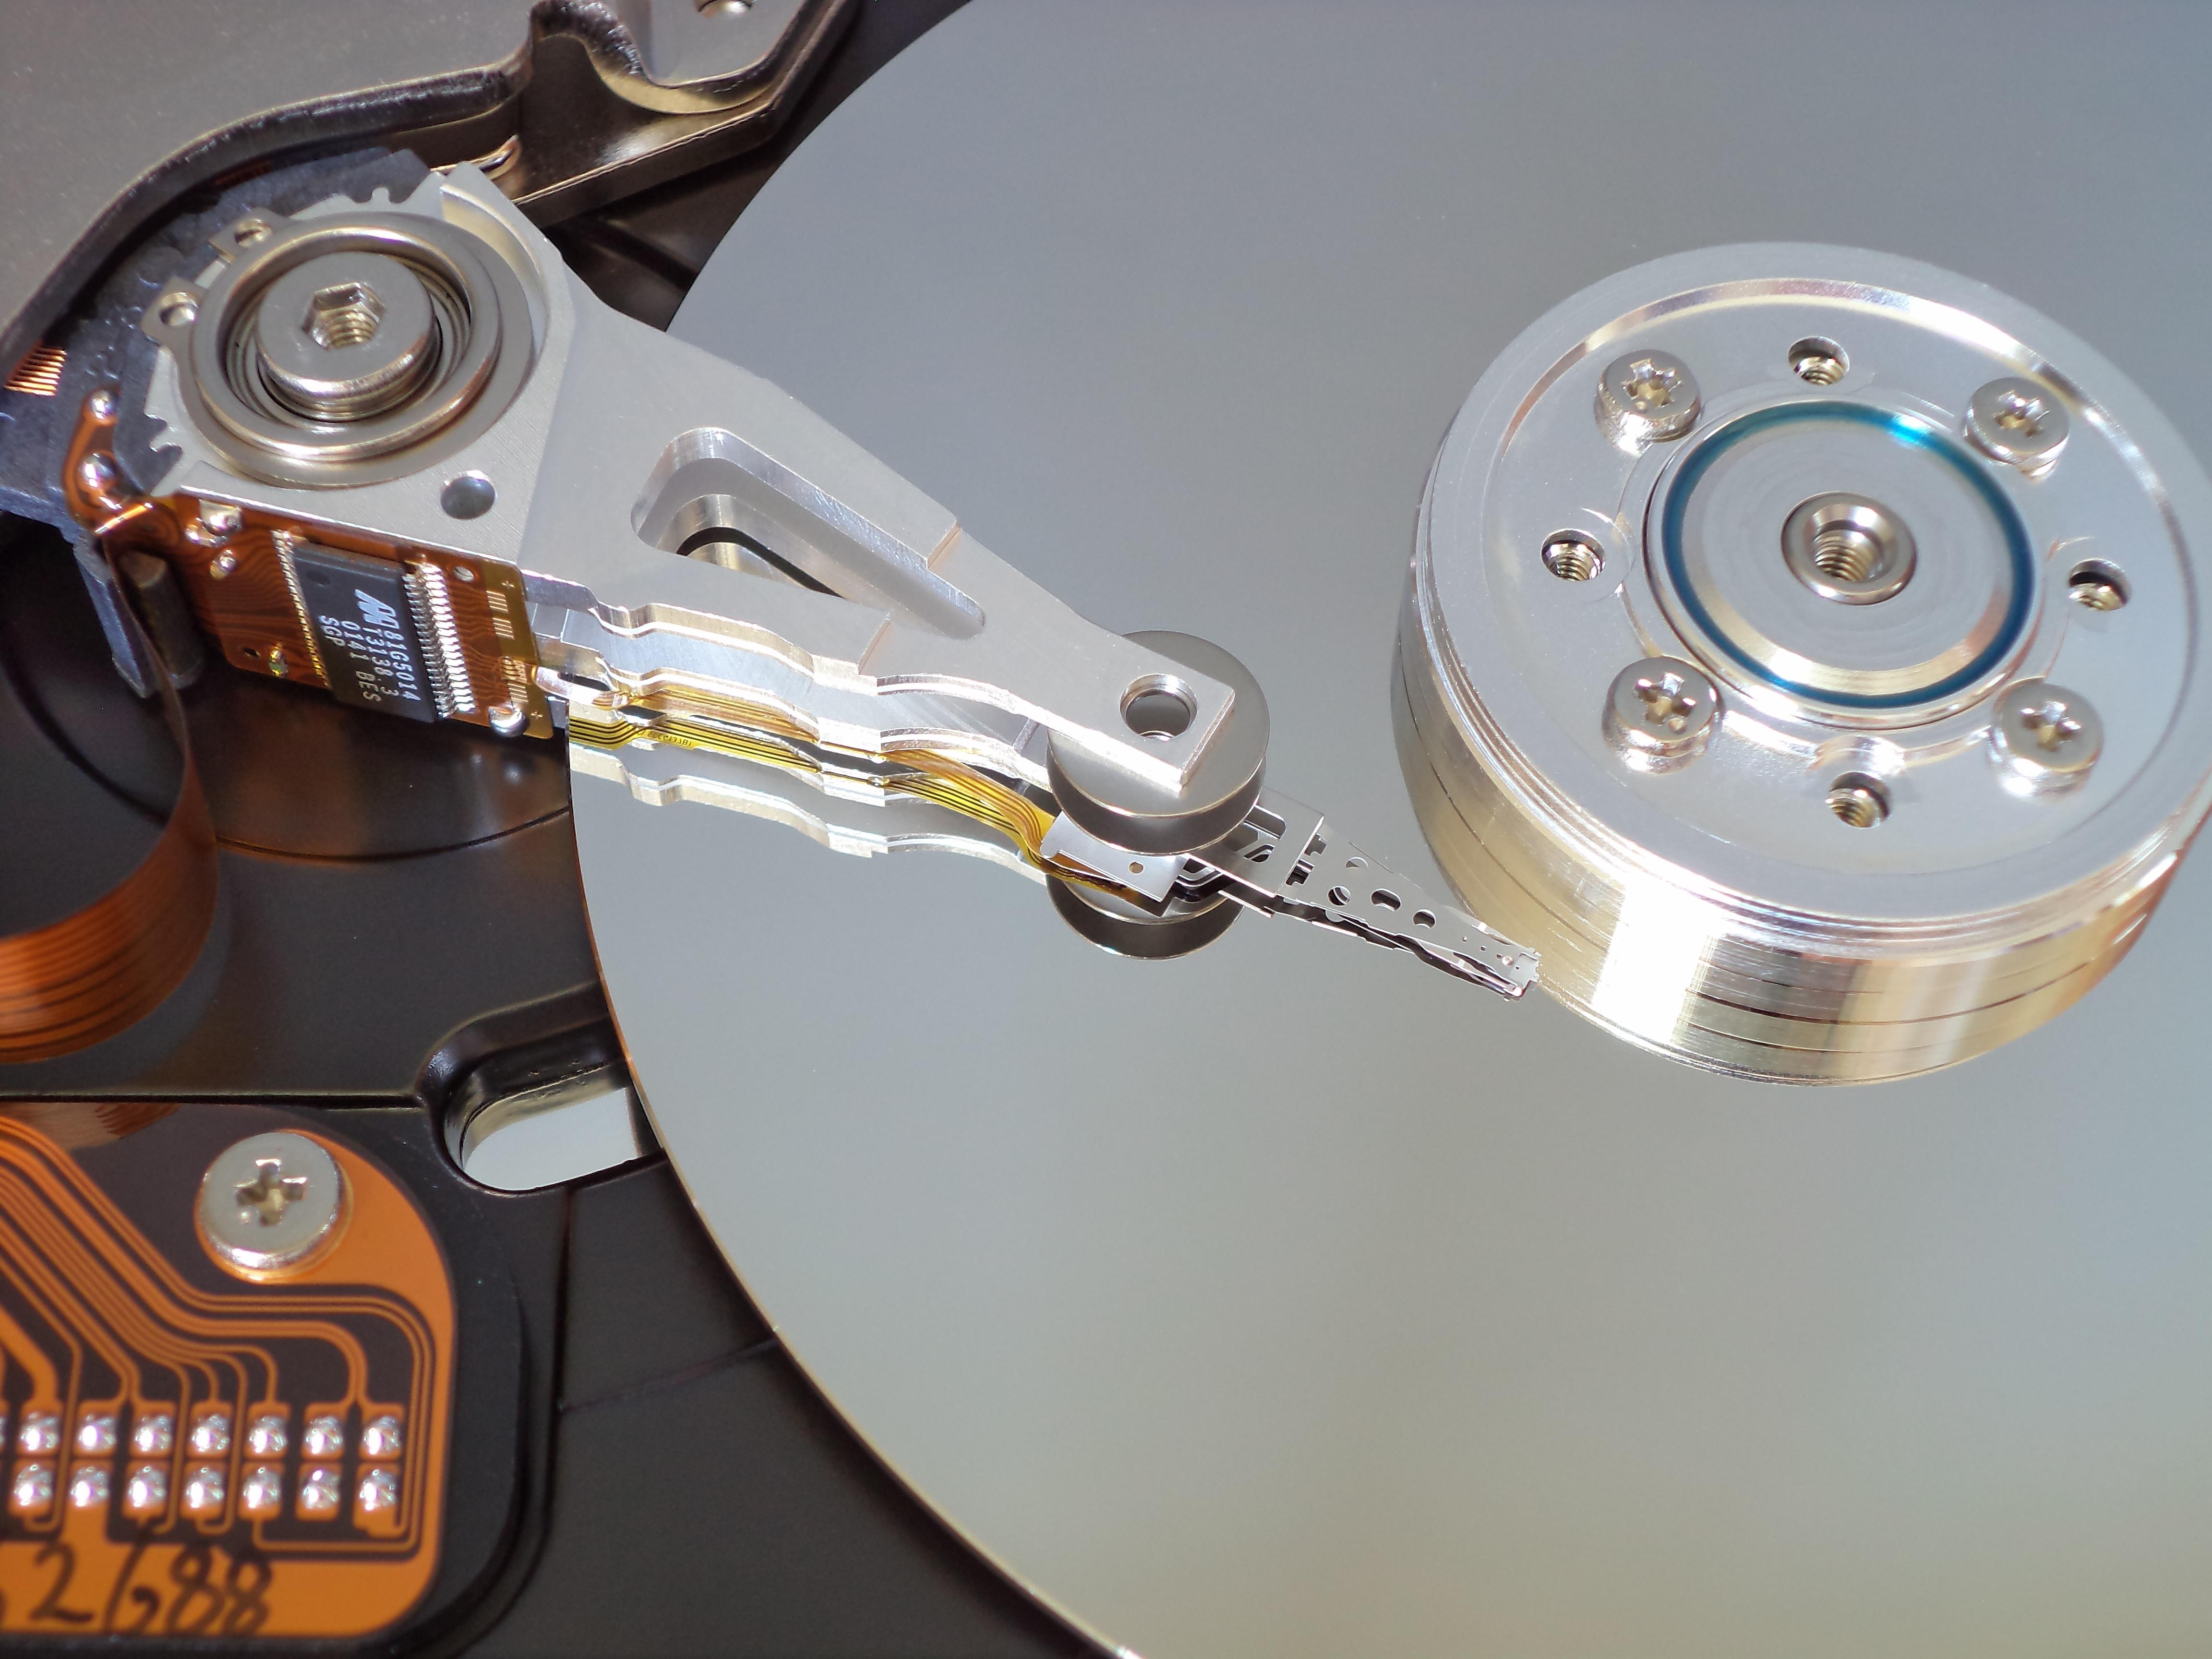 Data retrieval from broken hard drive